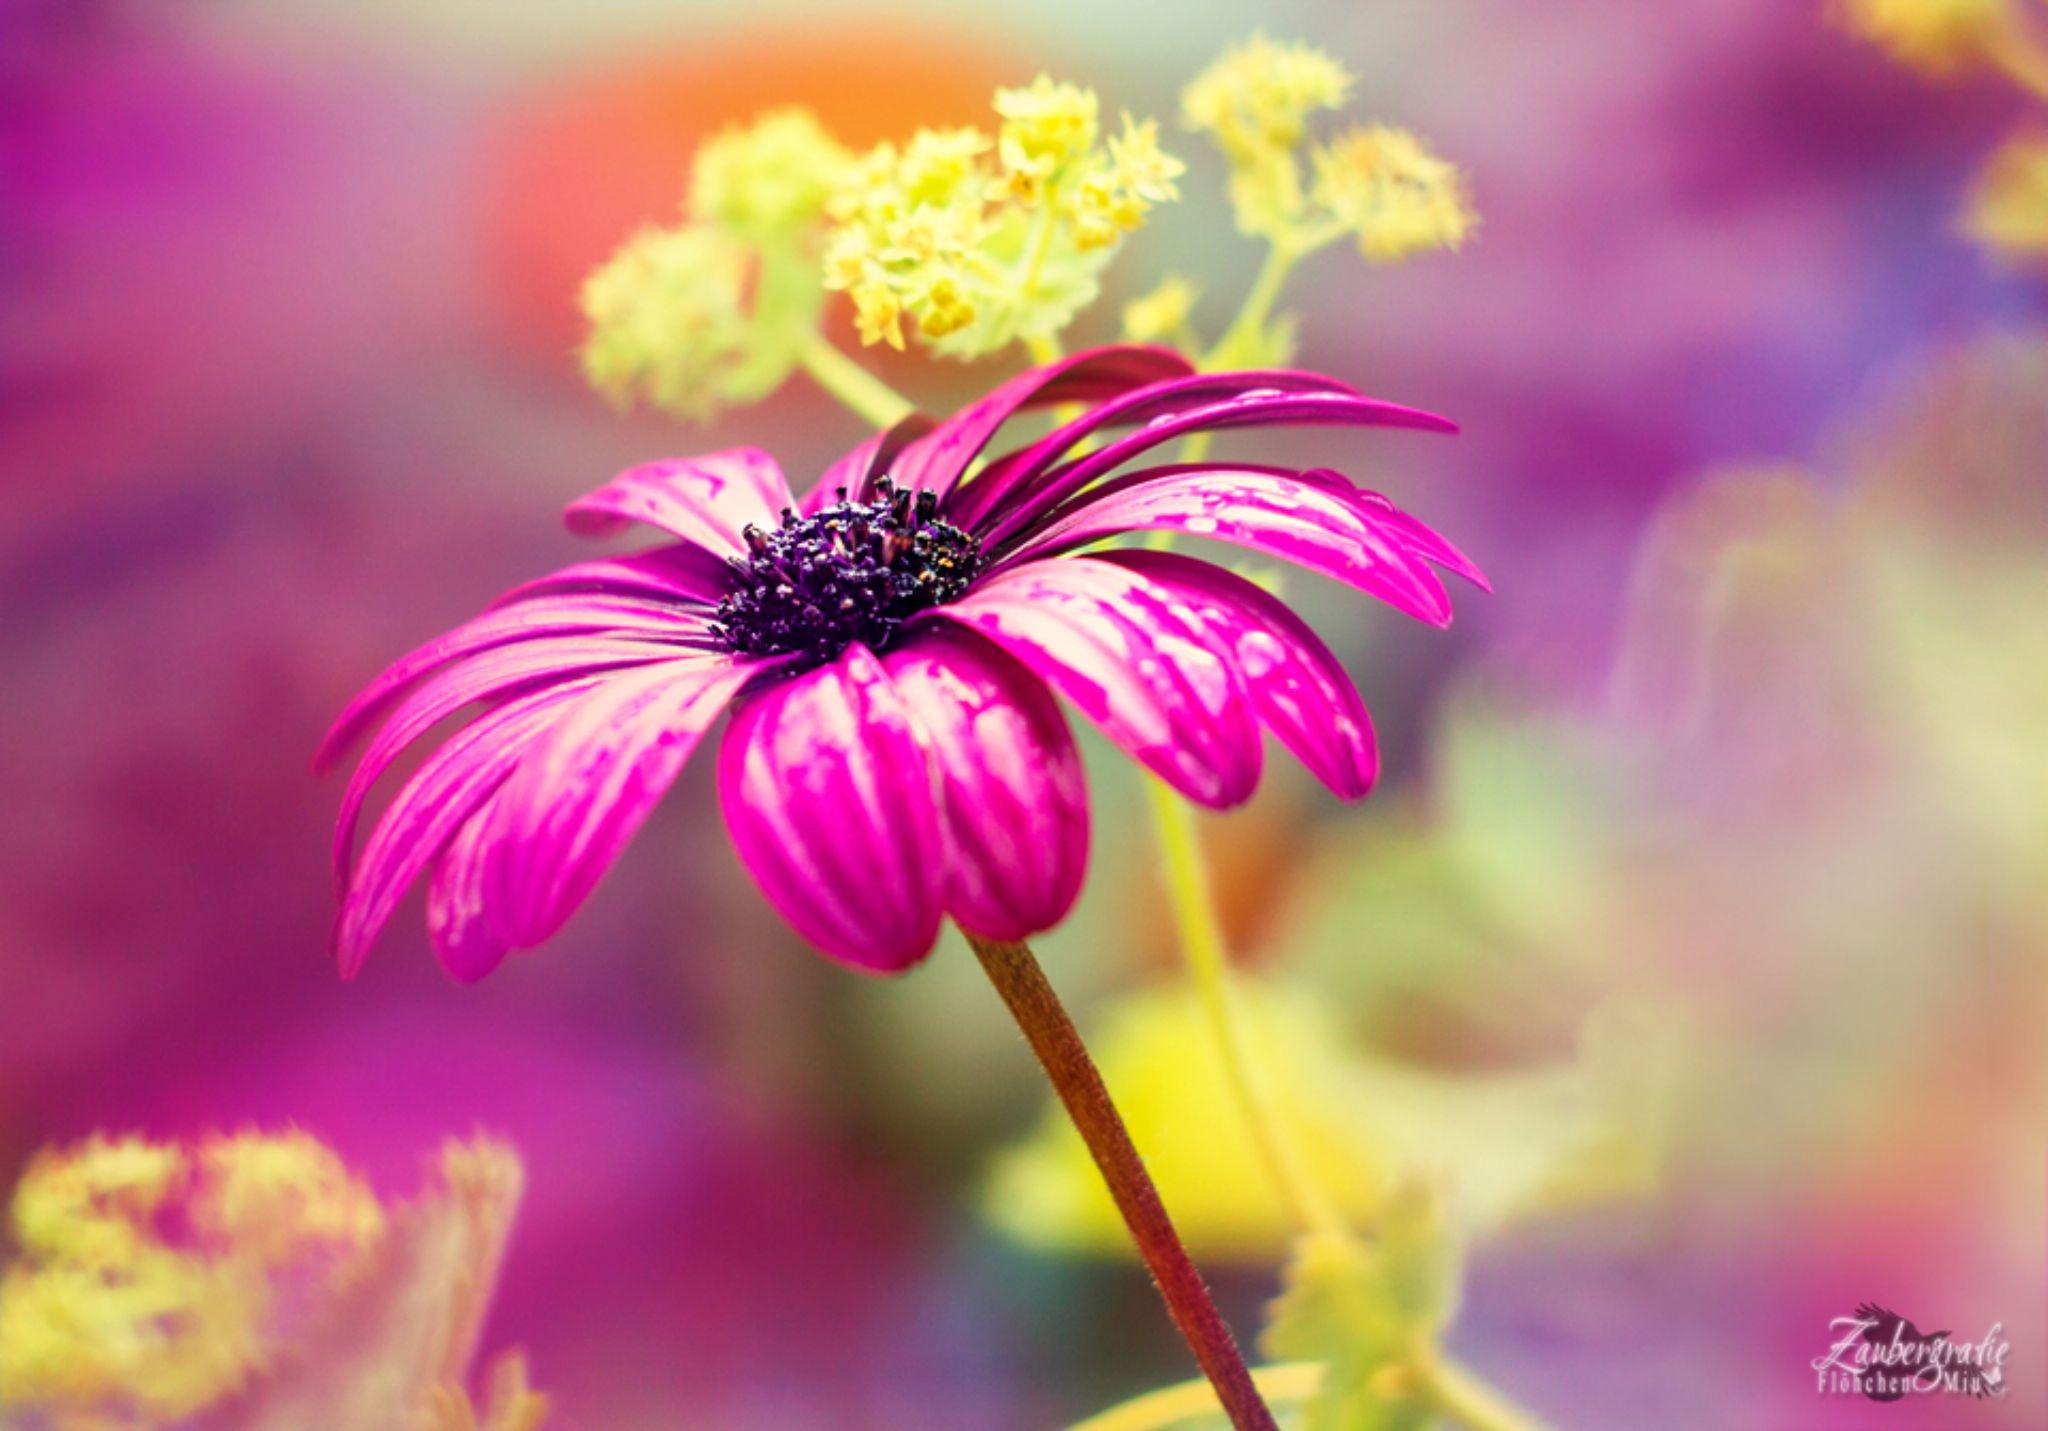 the magic of colors by Zaubergrafie